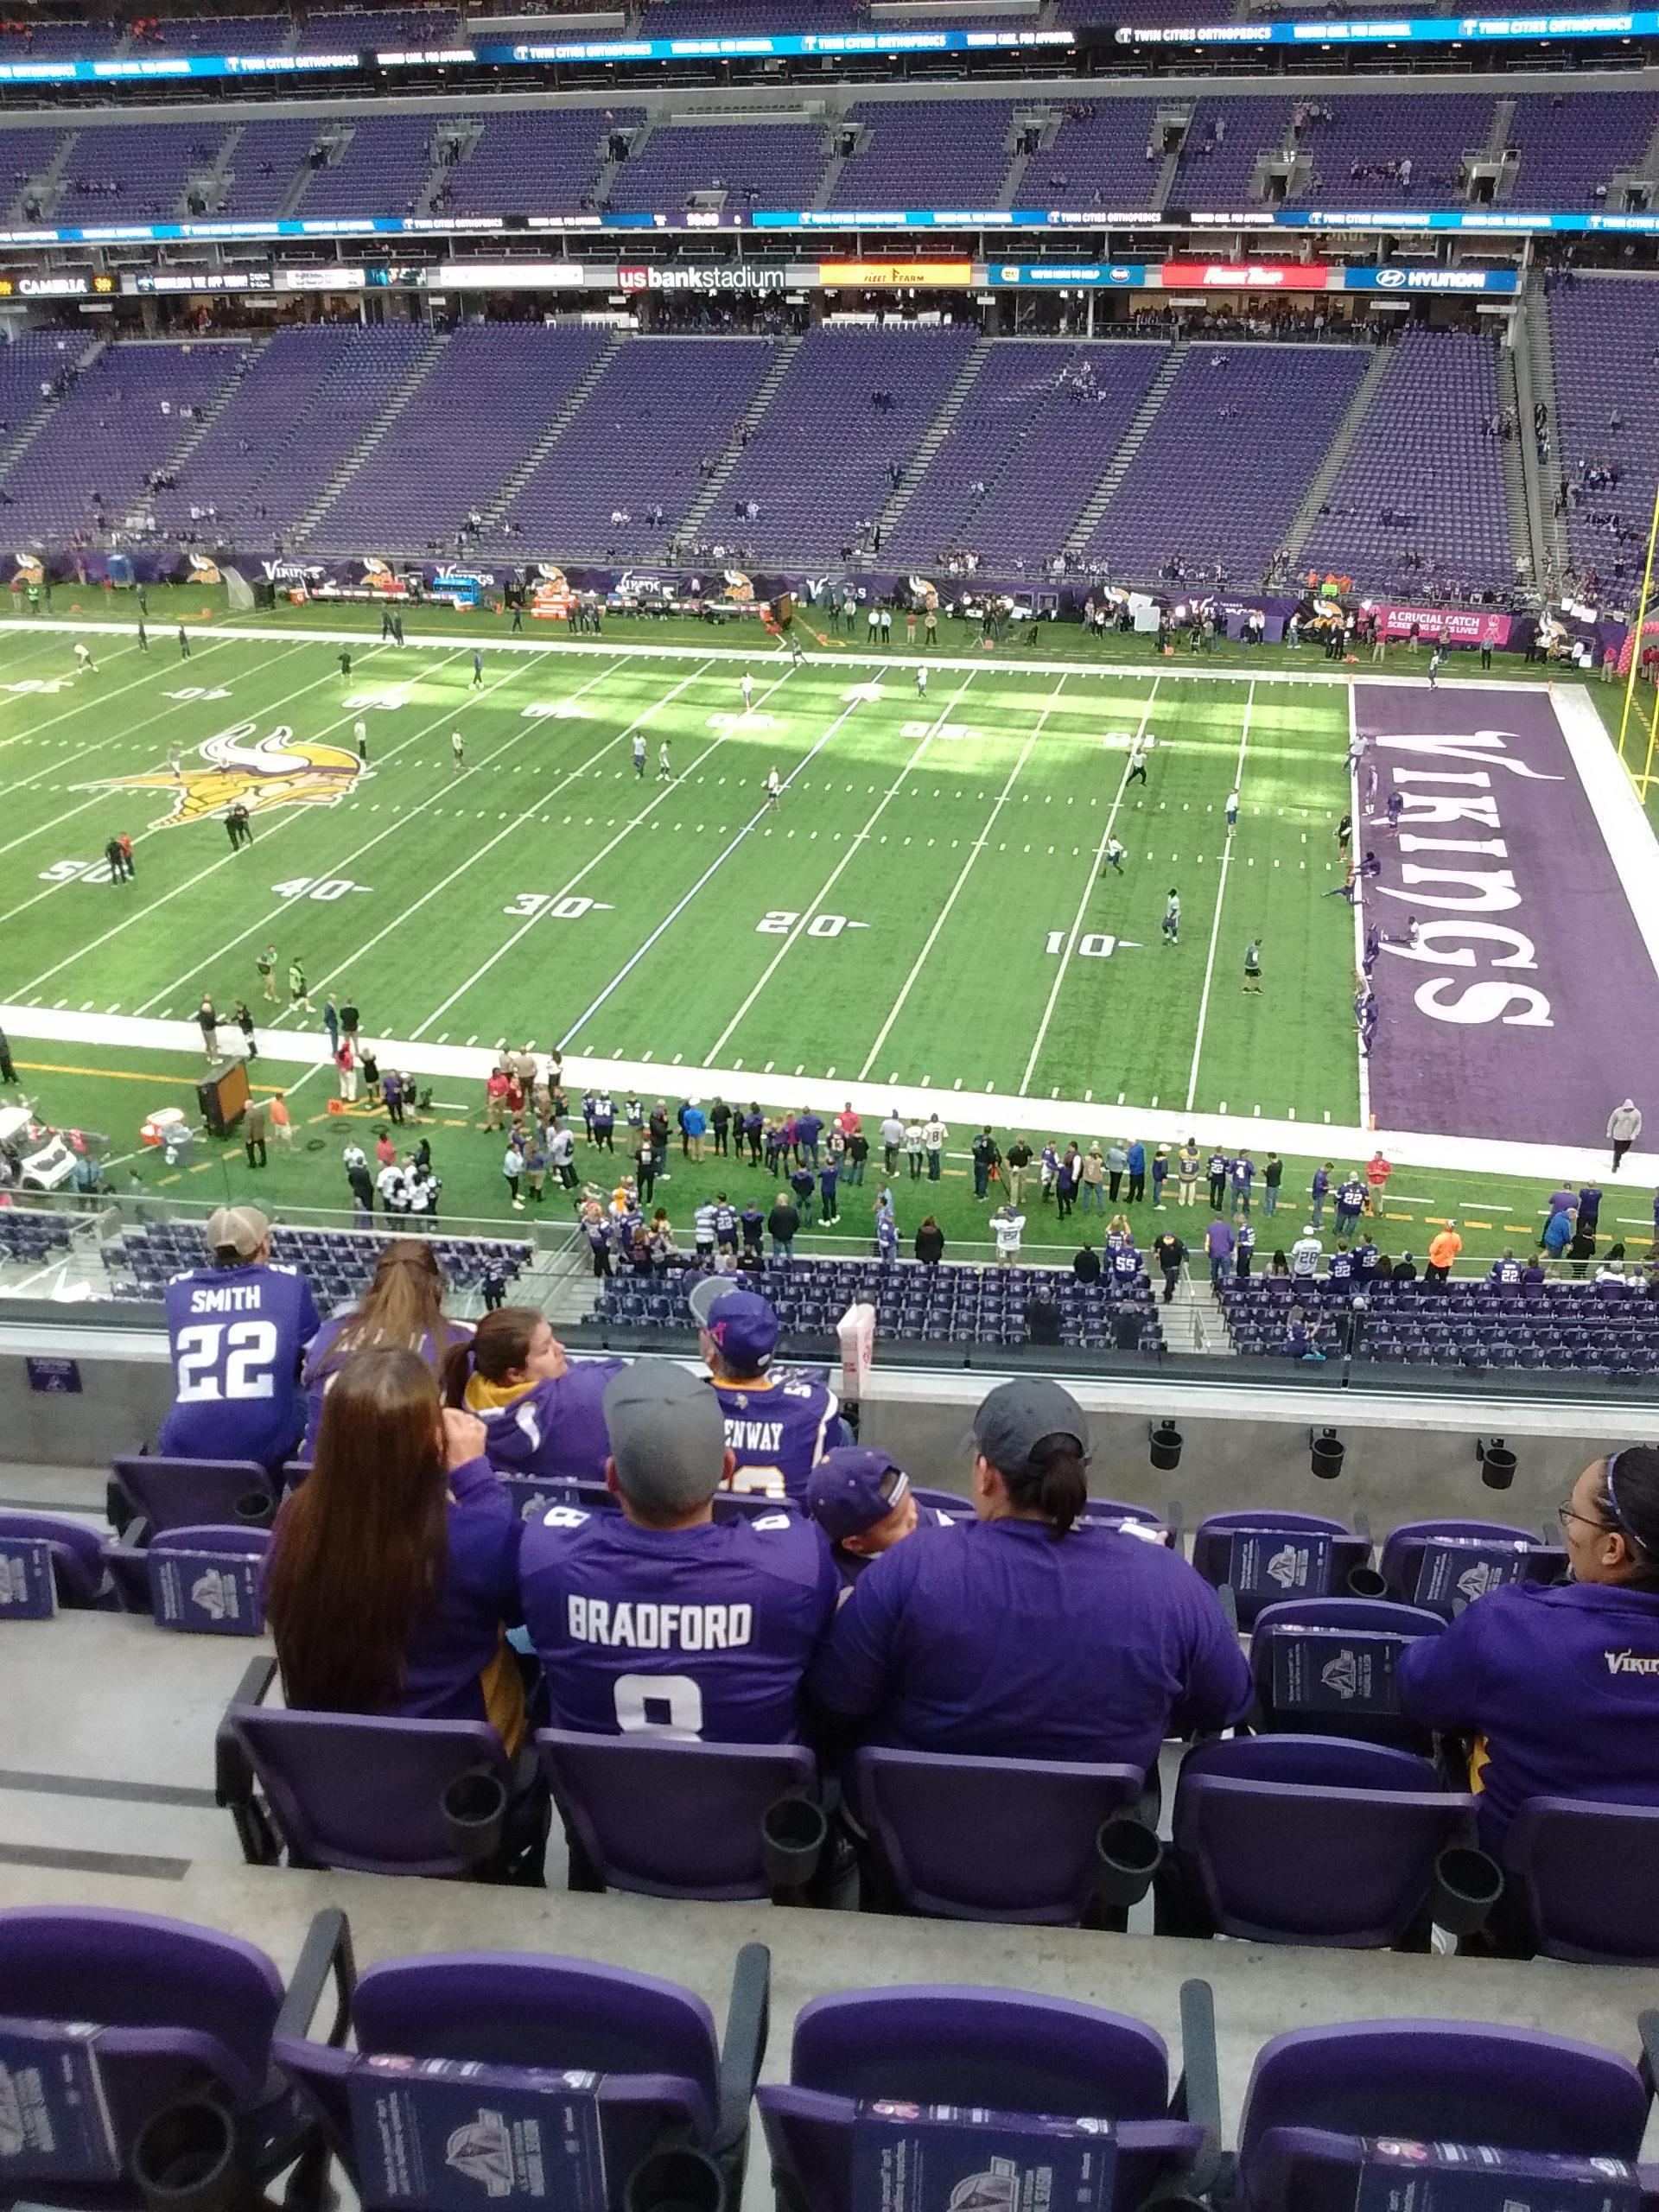 U.S. Bank Stadium Section 230 Row 6 Seat 17